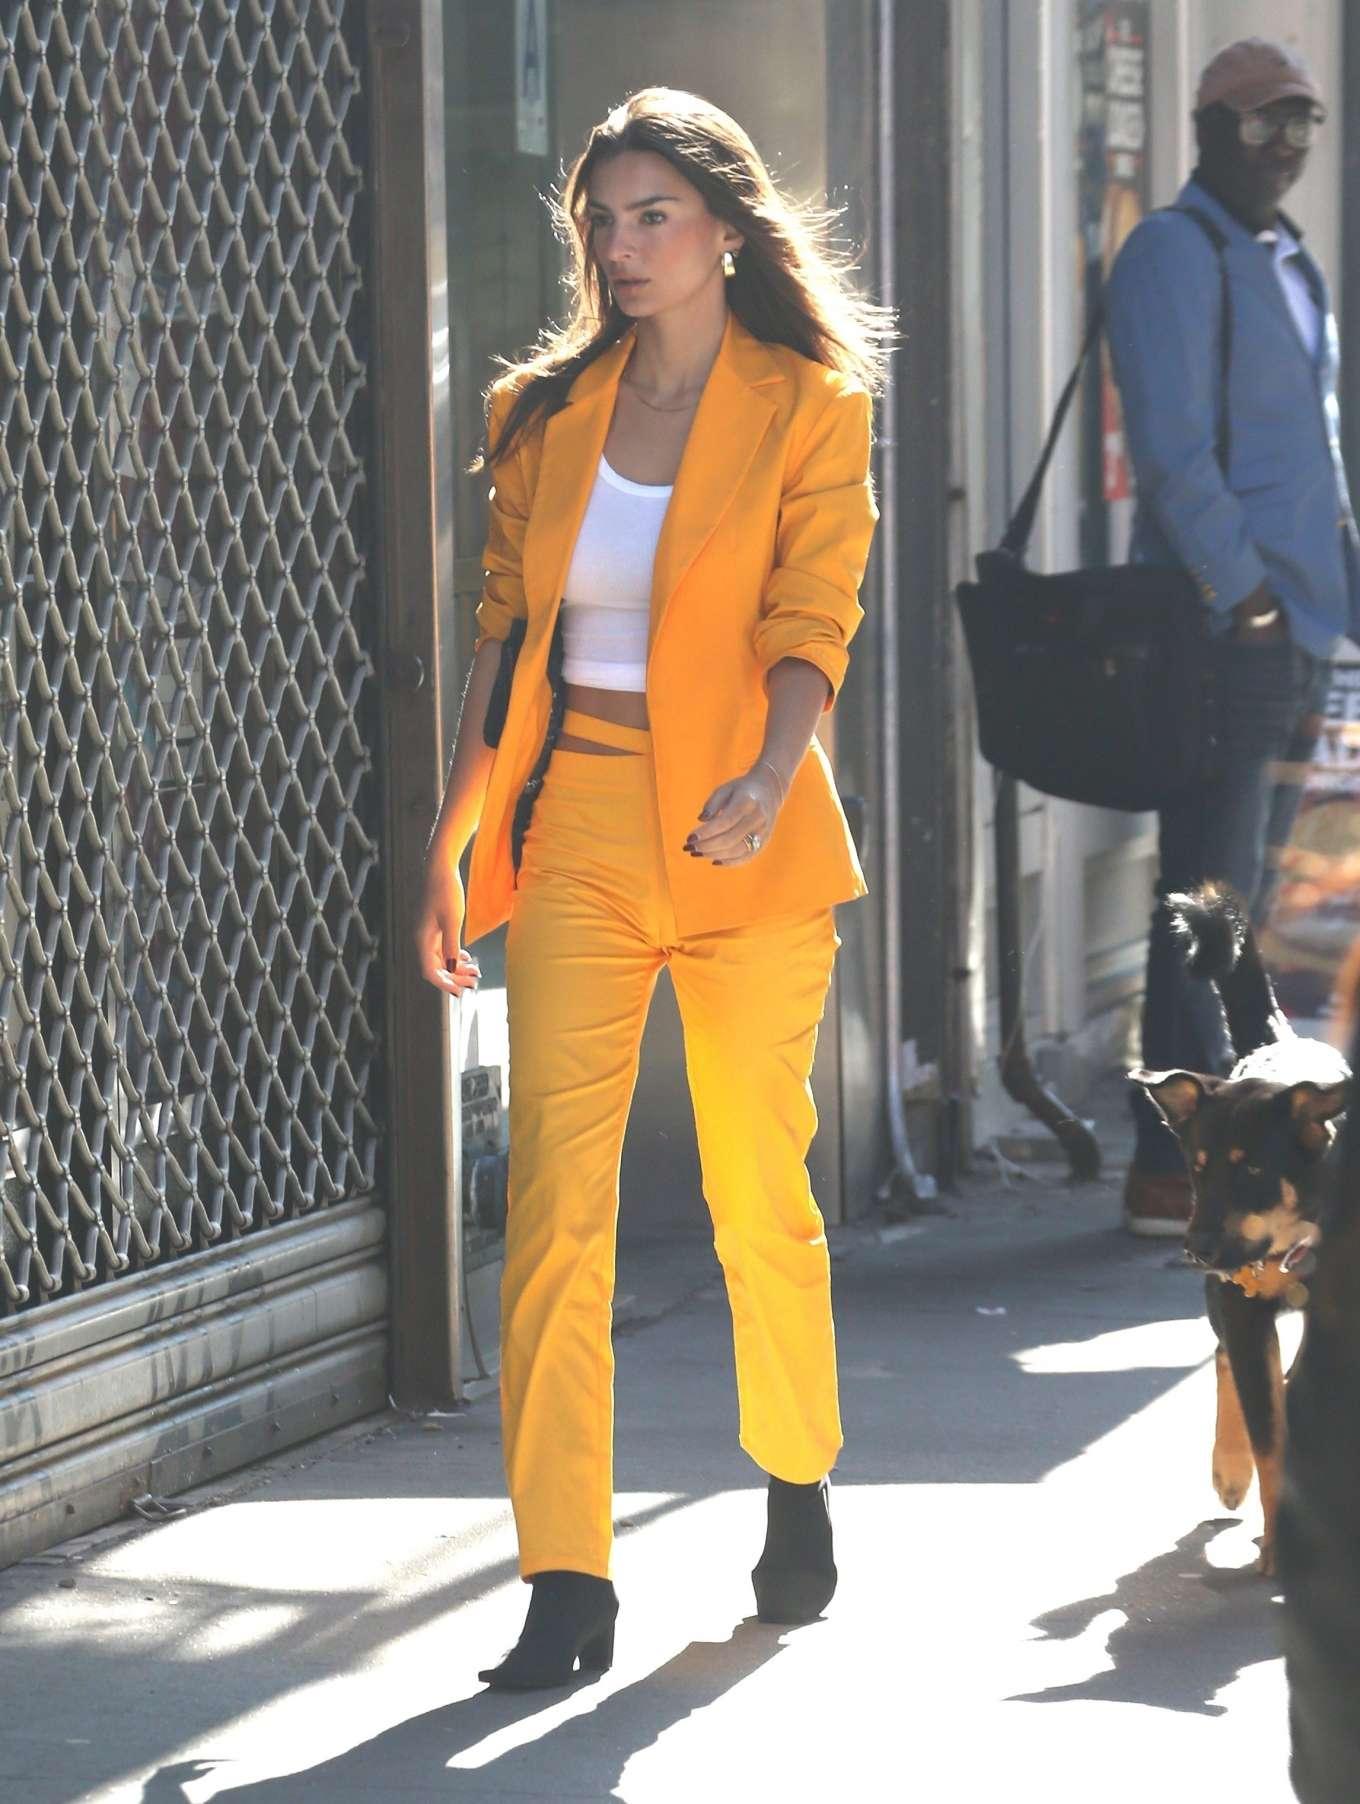 Emily Ratajkowski in Bold Orange Suit - Out in Manhattan